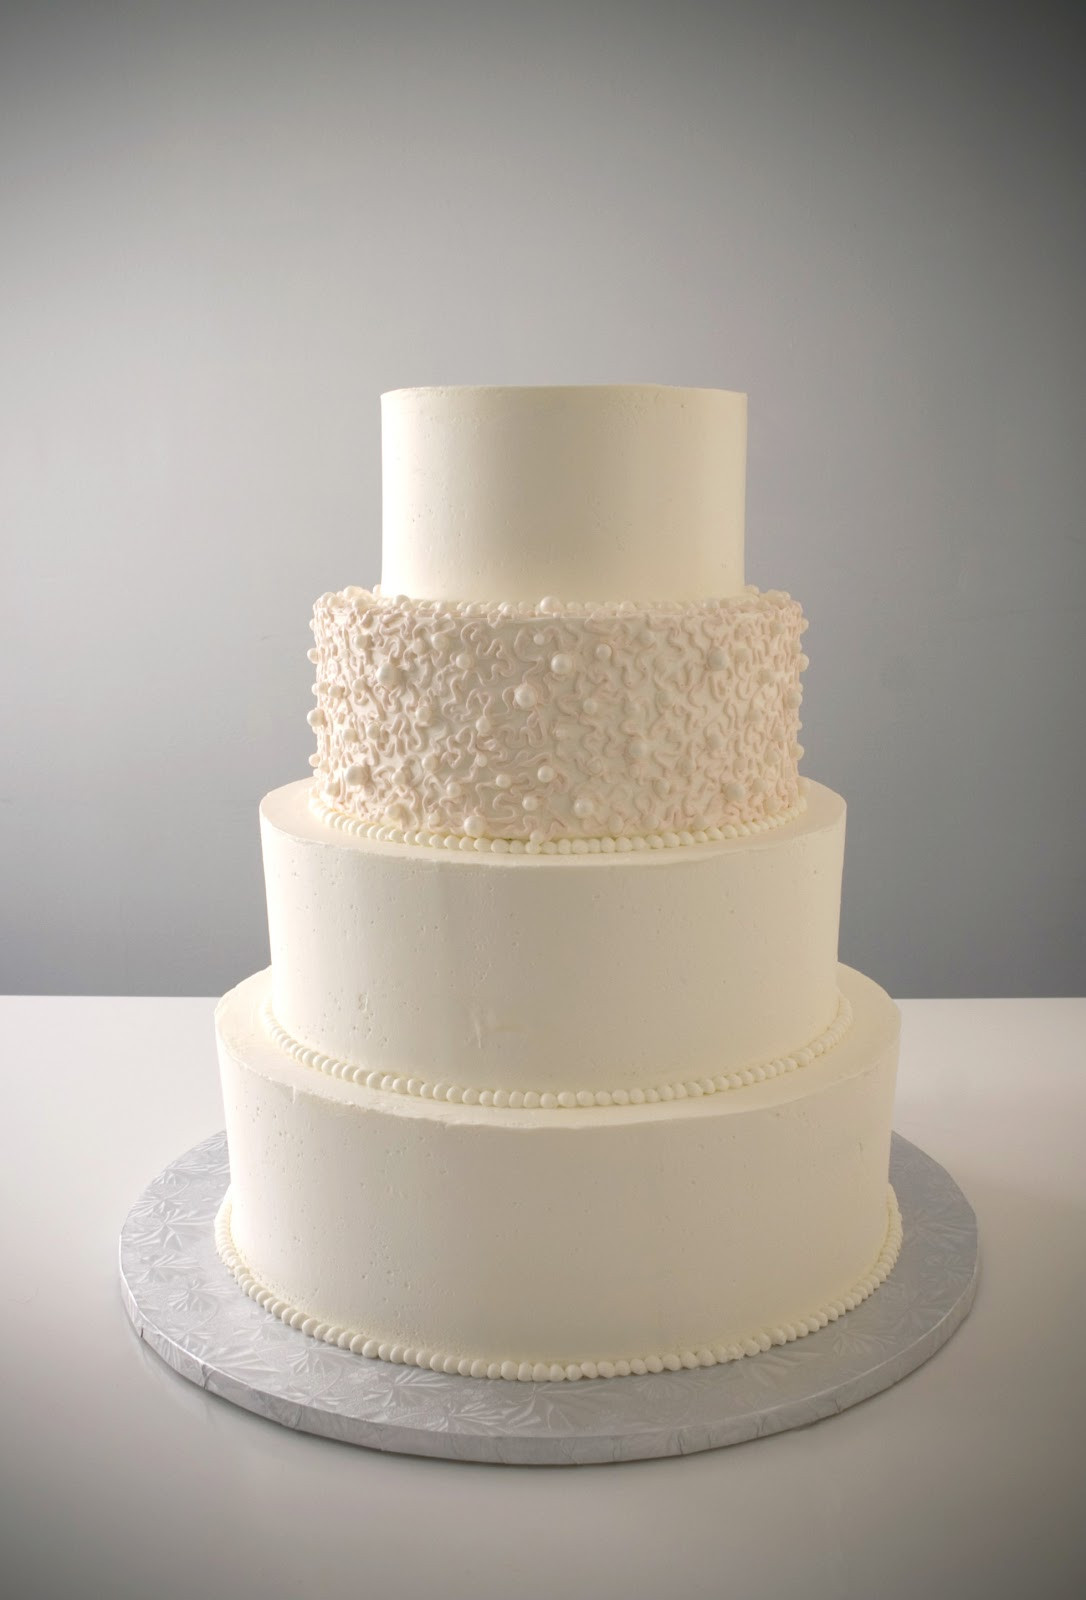 Simple Buttercream Wedding Cakes  A Simple Cake Customizing A Simple Cake